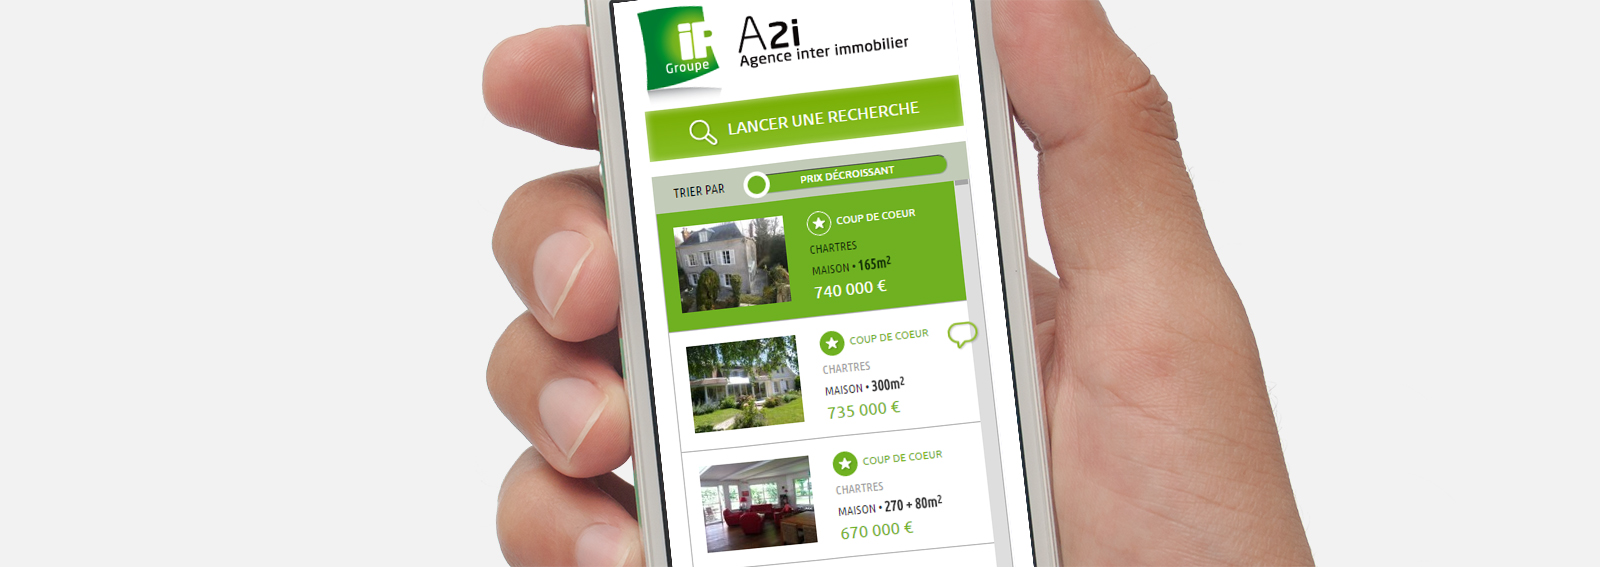 a2i-iphone a2i immobilier A2i immobilier a2i iphone